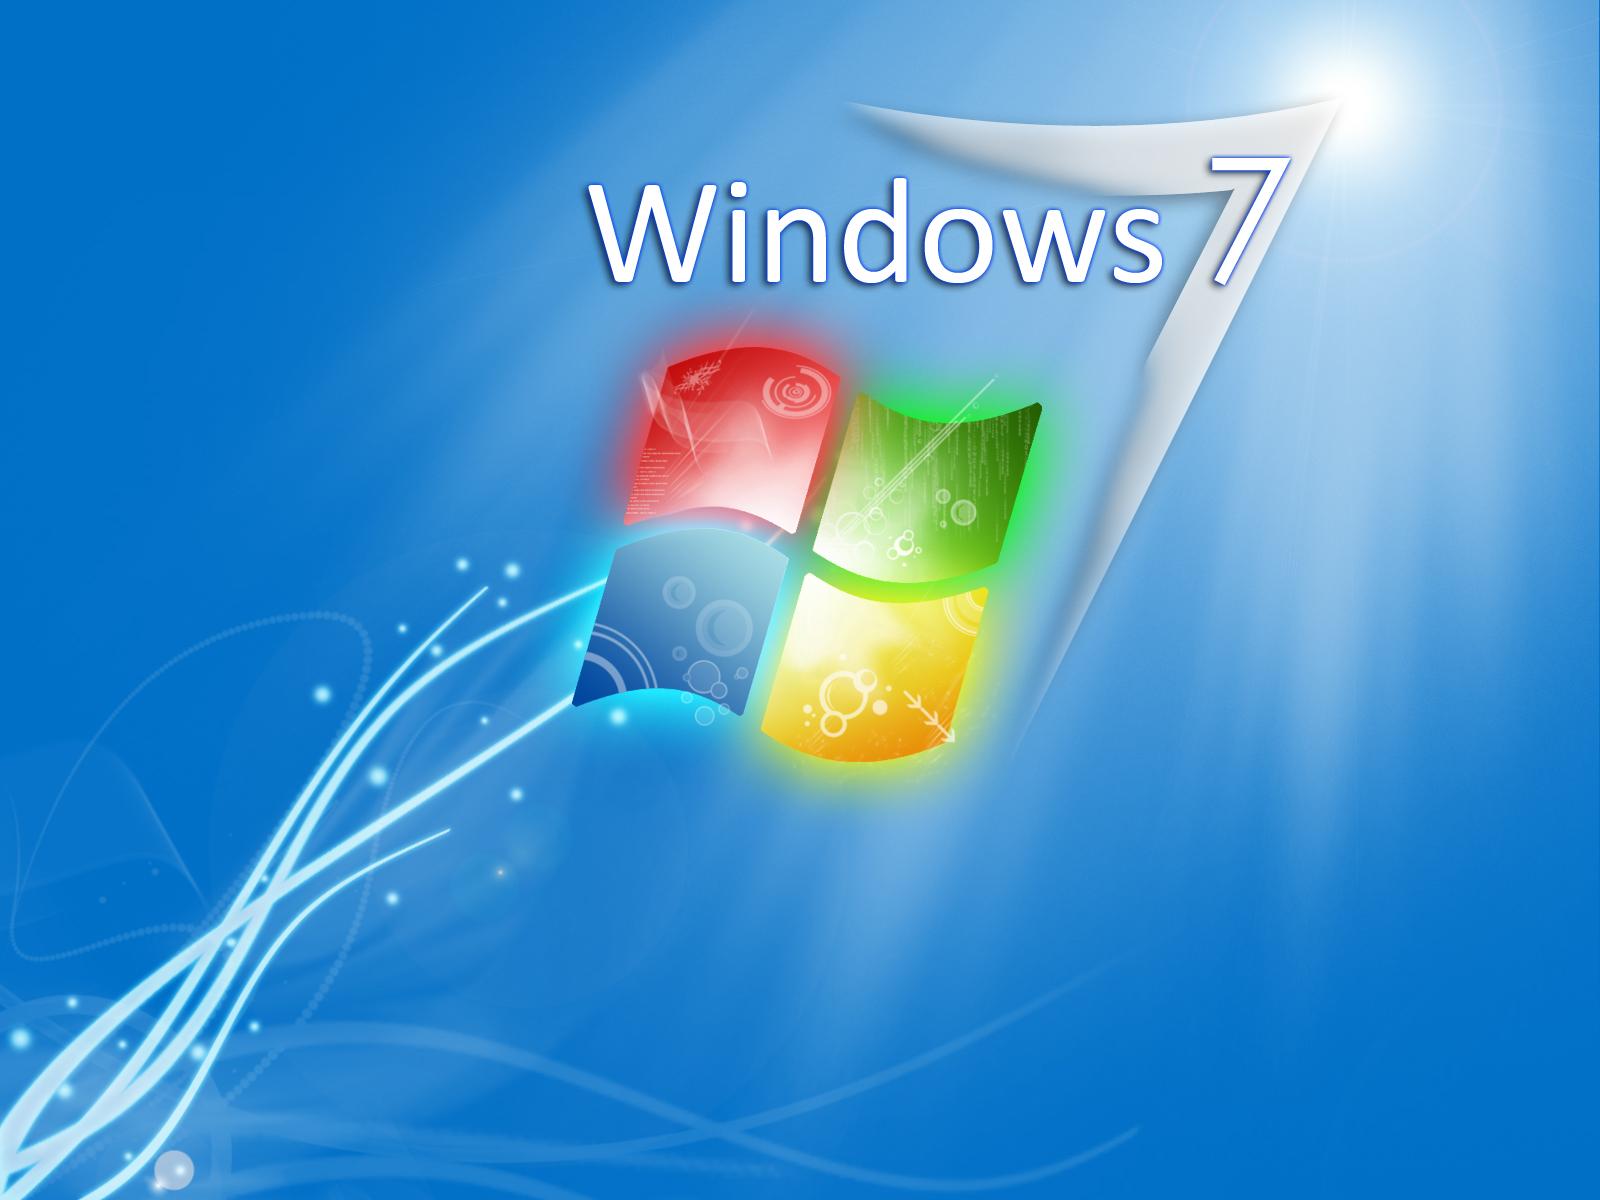 Desktop Backgrounds For Windows 7 Hd Sf Wallpaper